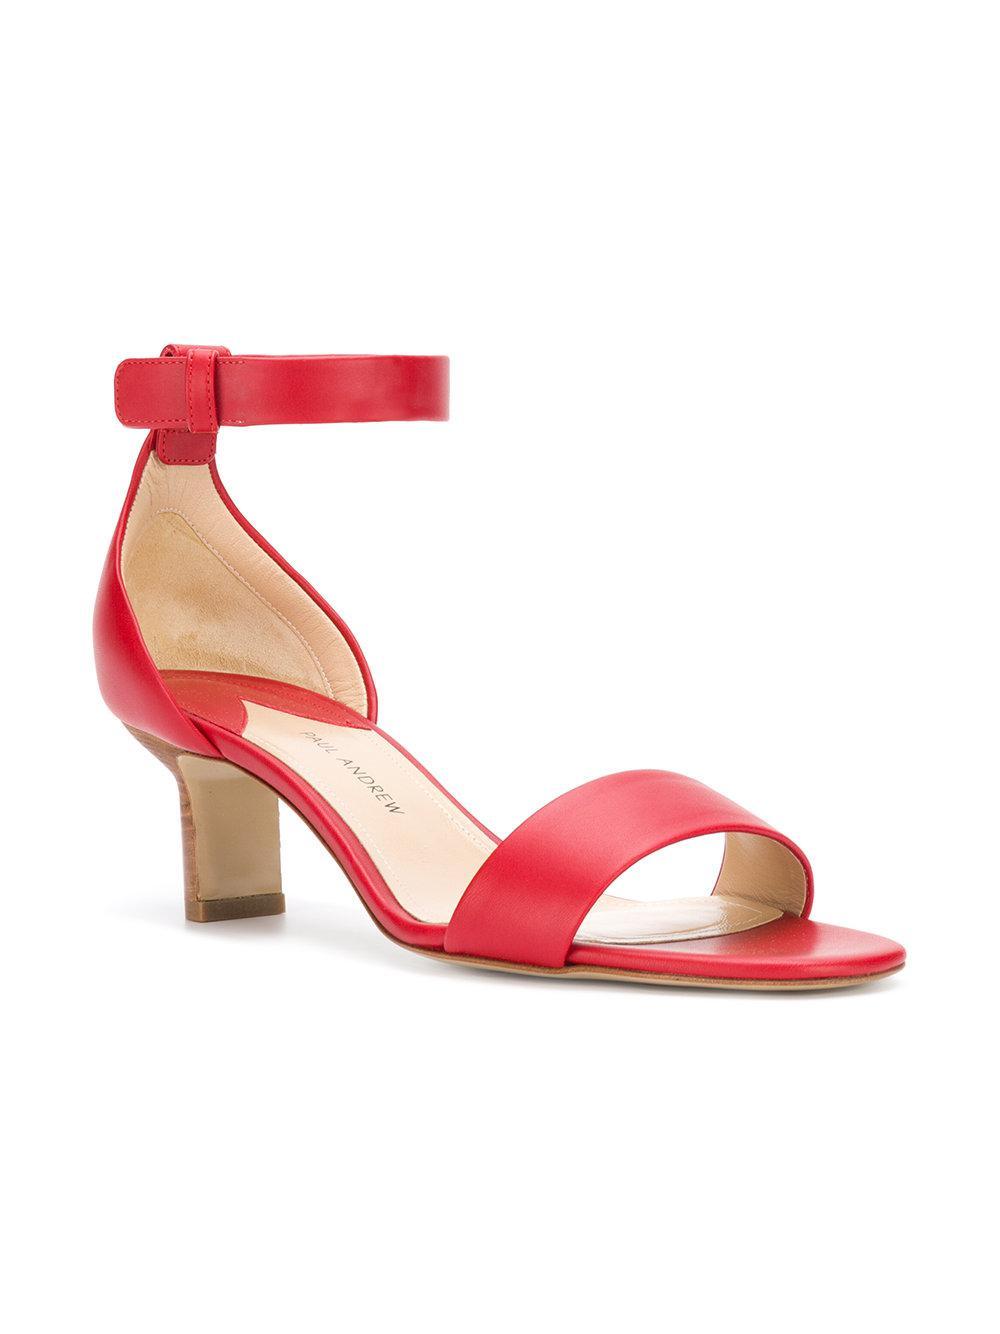 PAUL ANDREW Buckle sandals